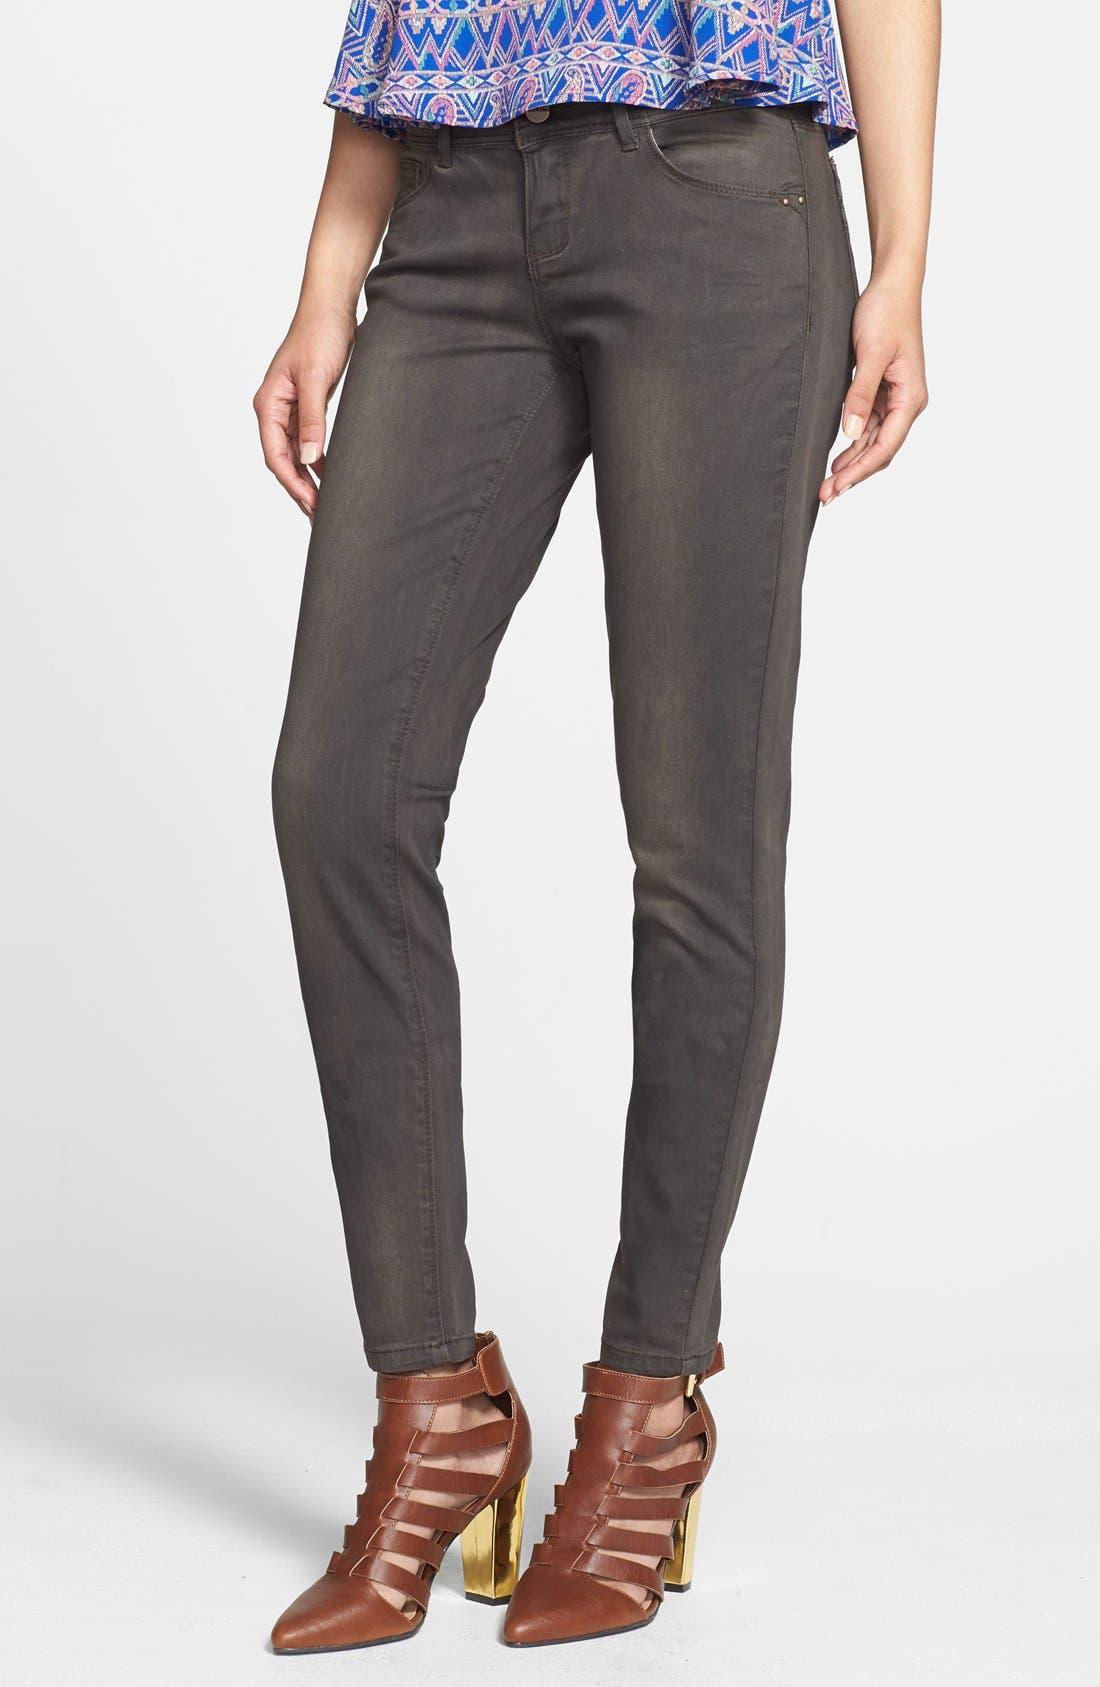 Alternate Image 1 Selected - HART Denim Overdyed Skinny Jeans (Brown) (Juniors)